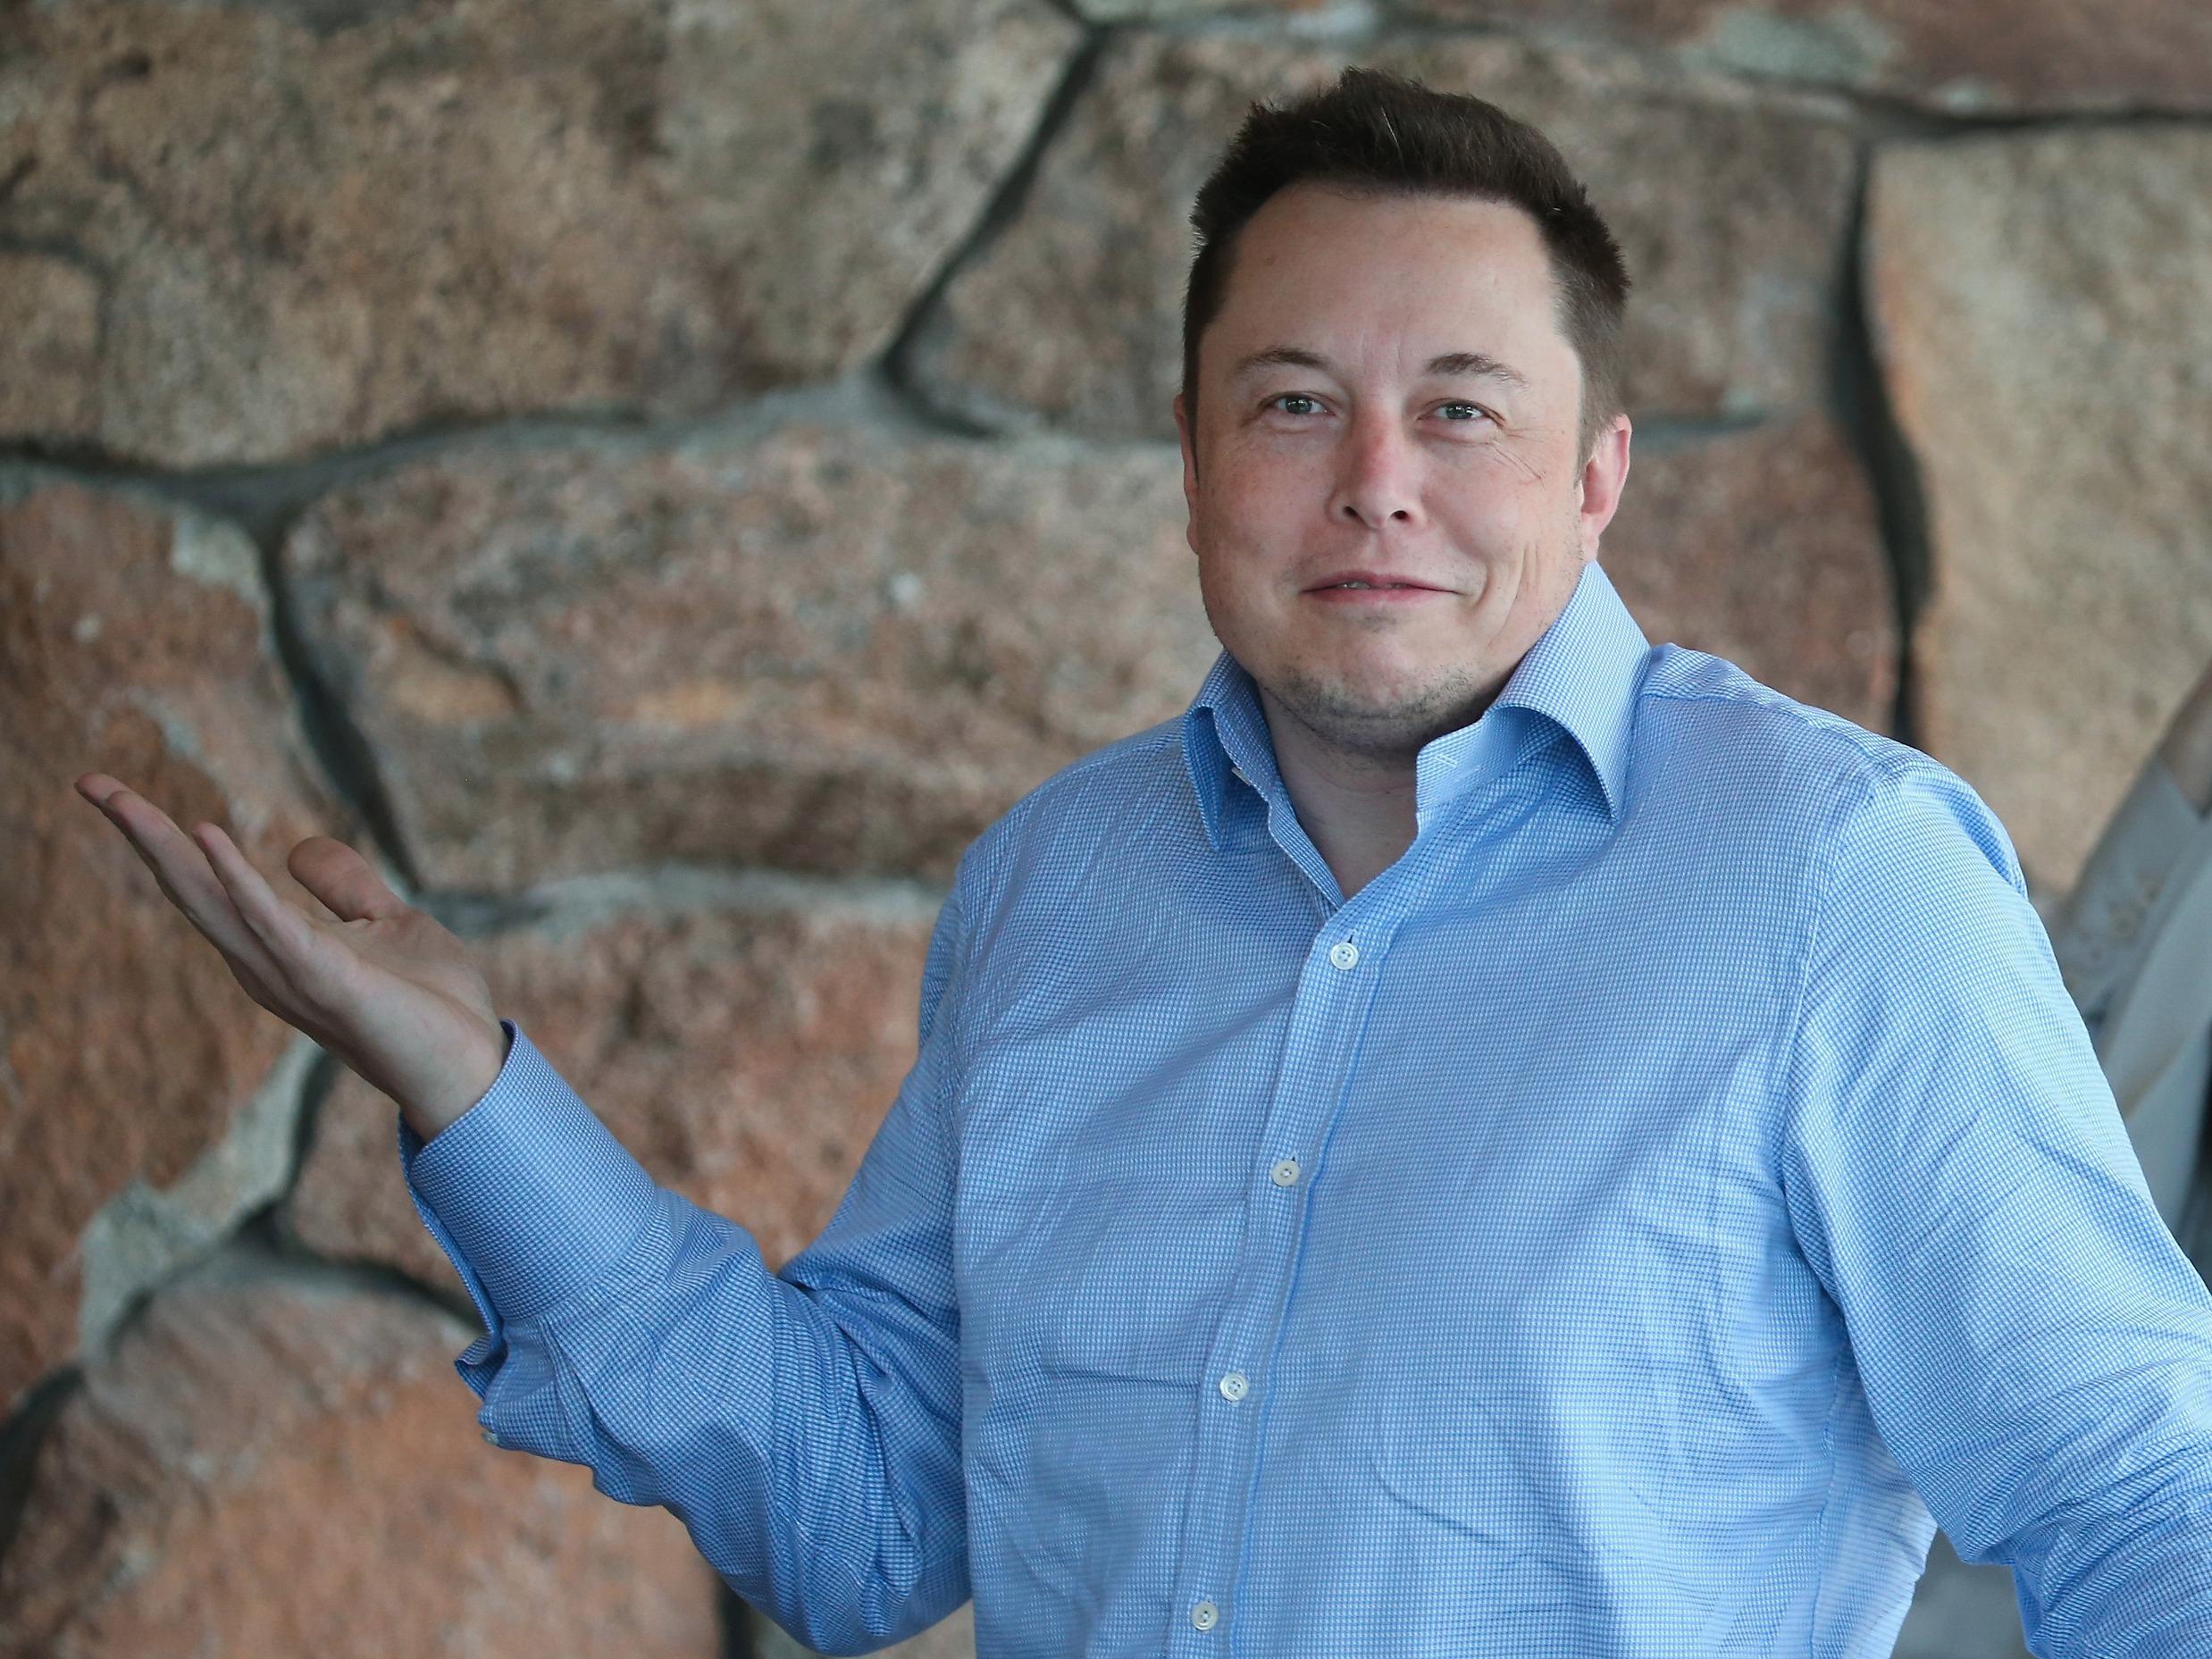 Elon Musk High Quality Wallpapers